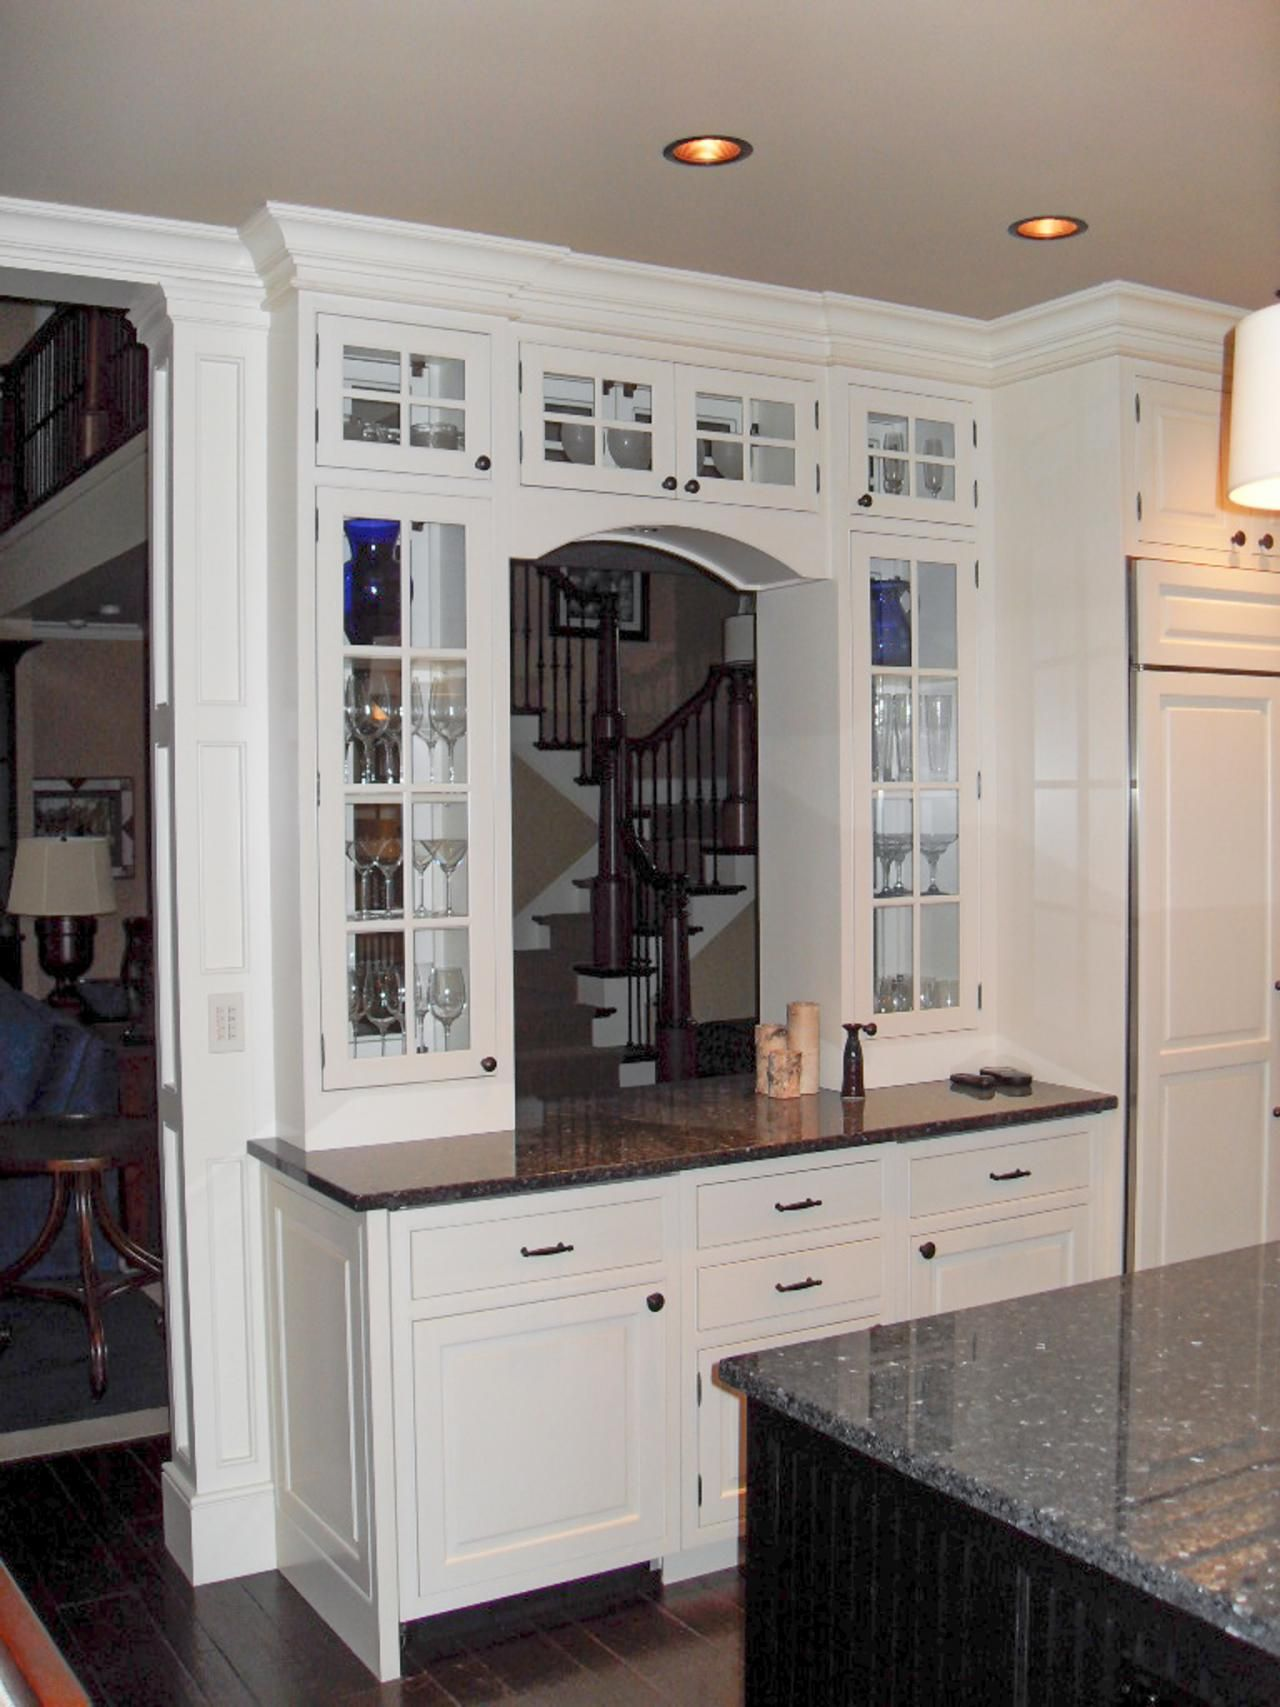 Transitional Kitchen Pass Through Opens Up Space Kitchen Pass Transitional Kitchen Kitchen Inspiration Design